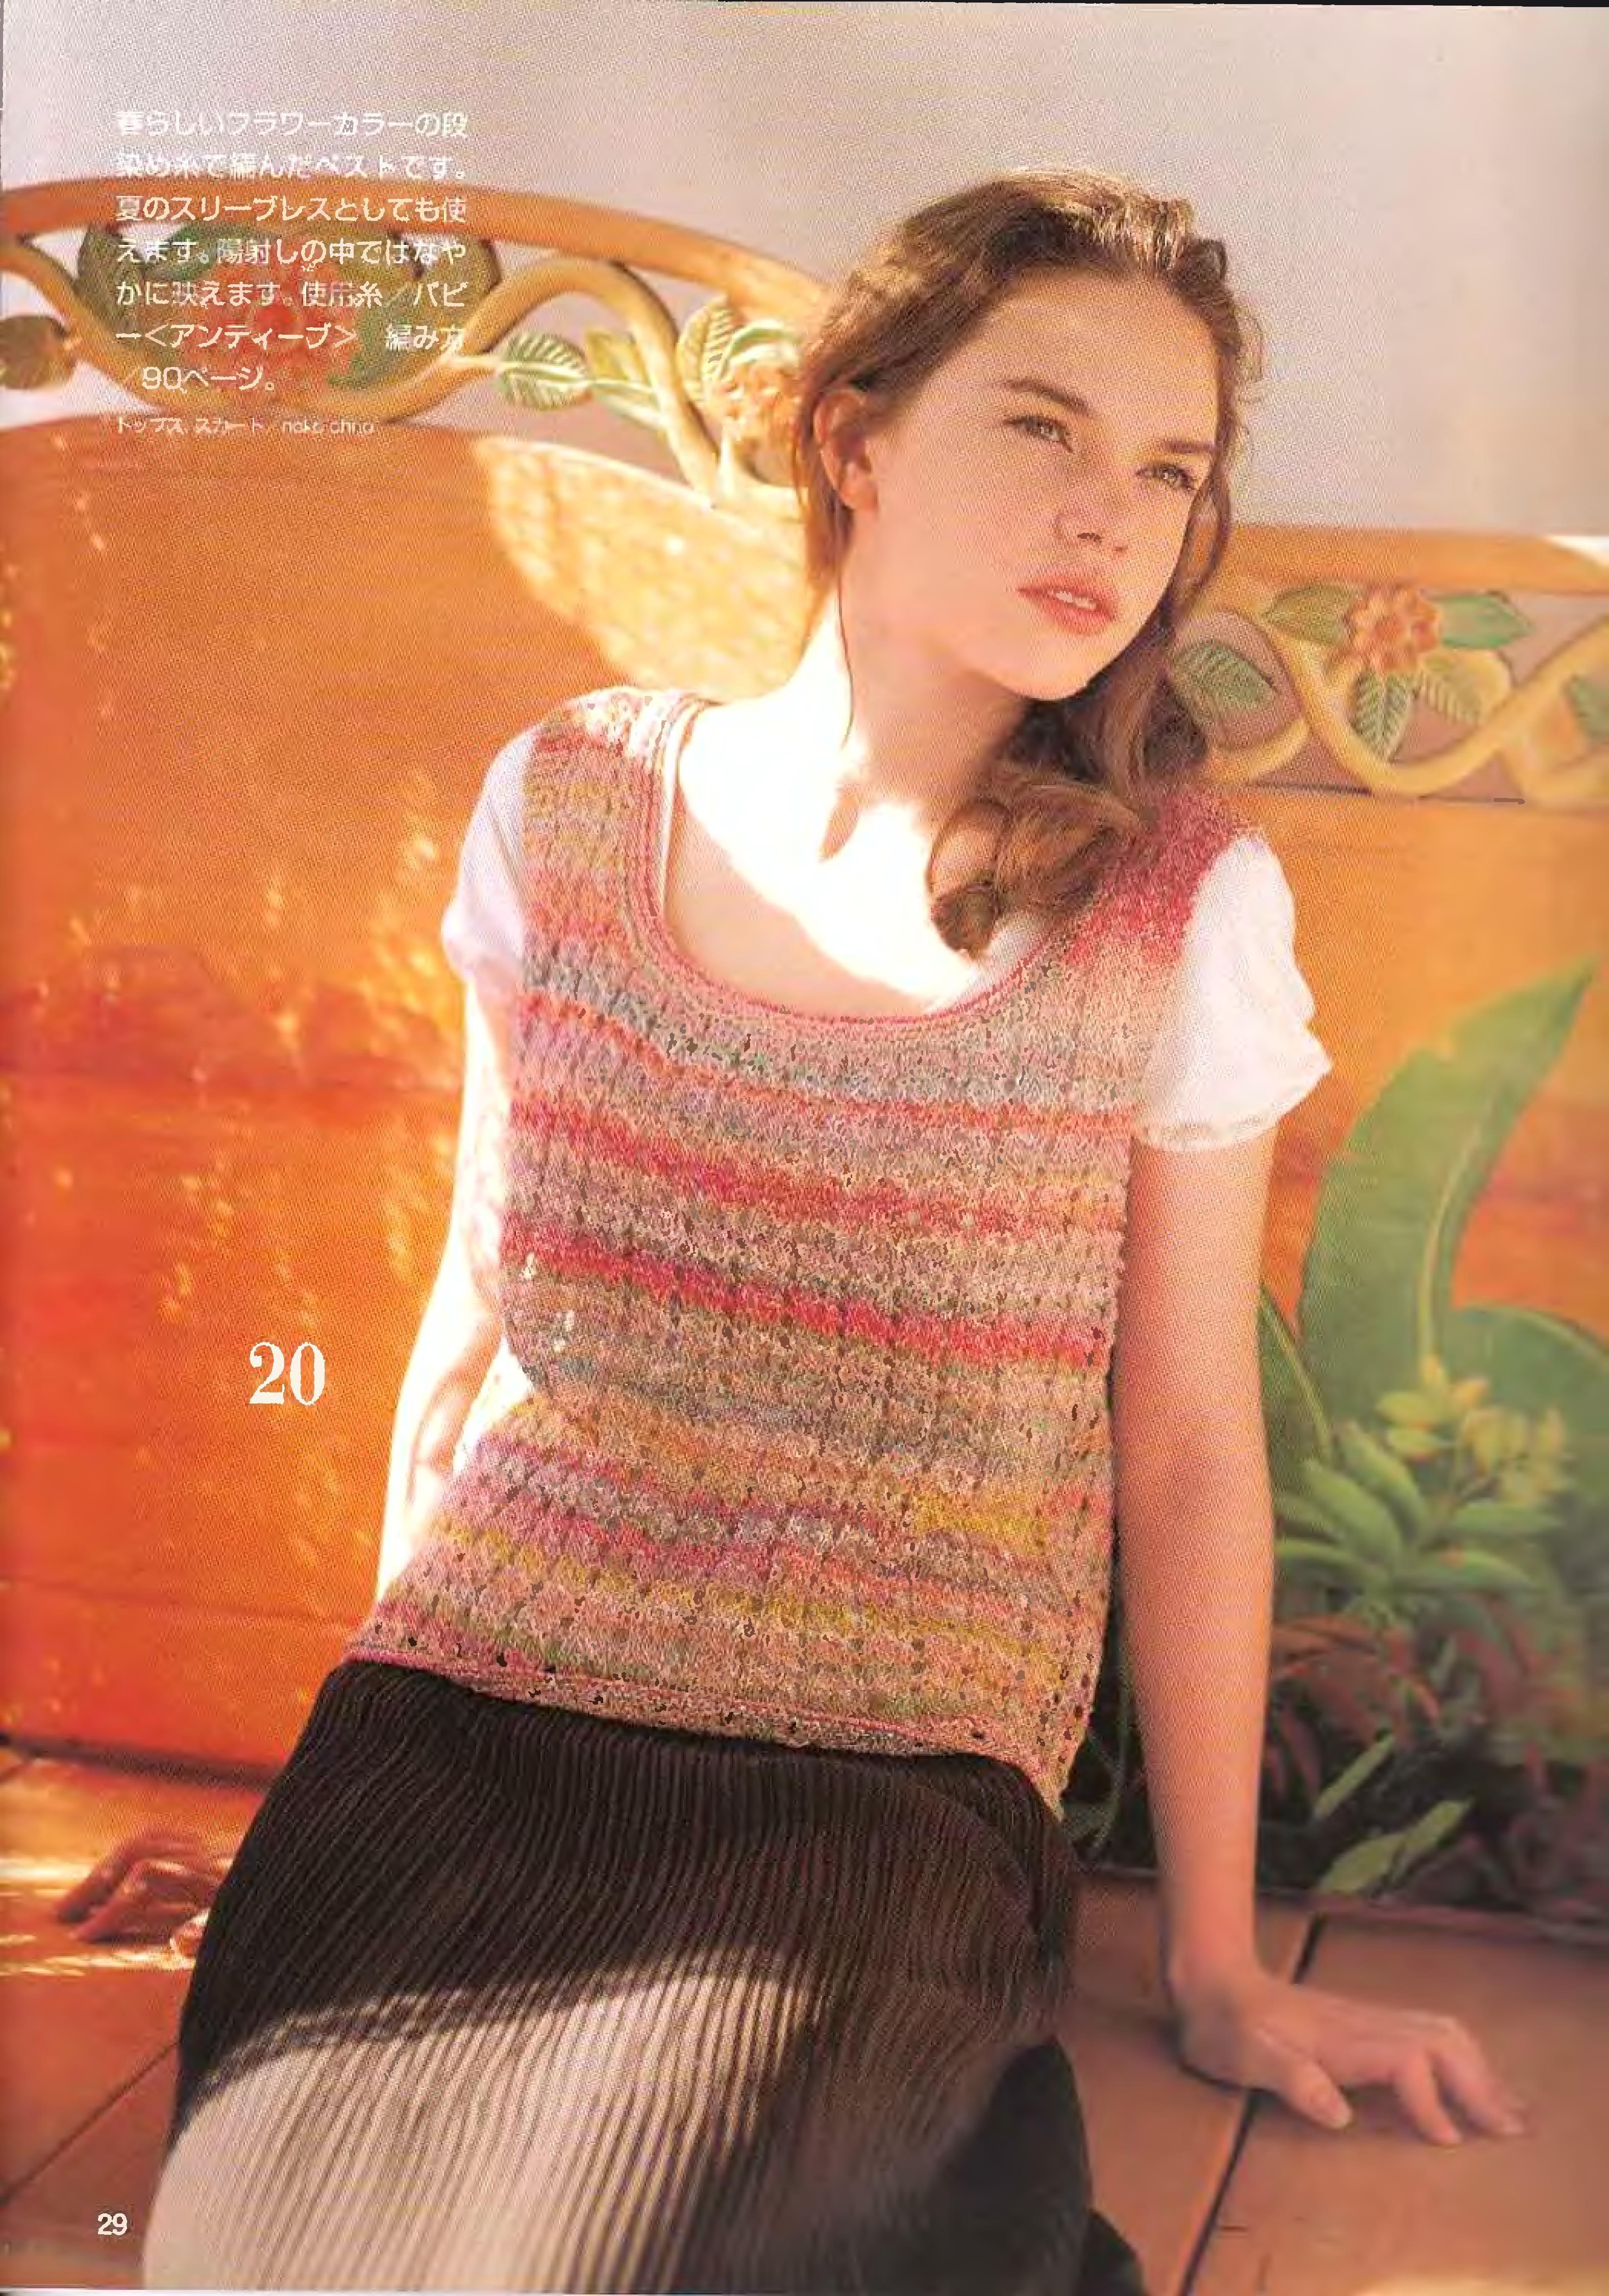 Lets-knit-series-NV4359-2008-Spring-Summer-sp-kr_27.jpg